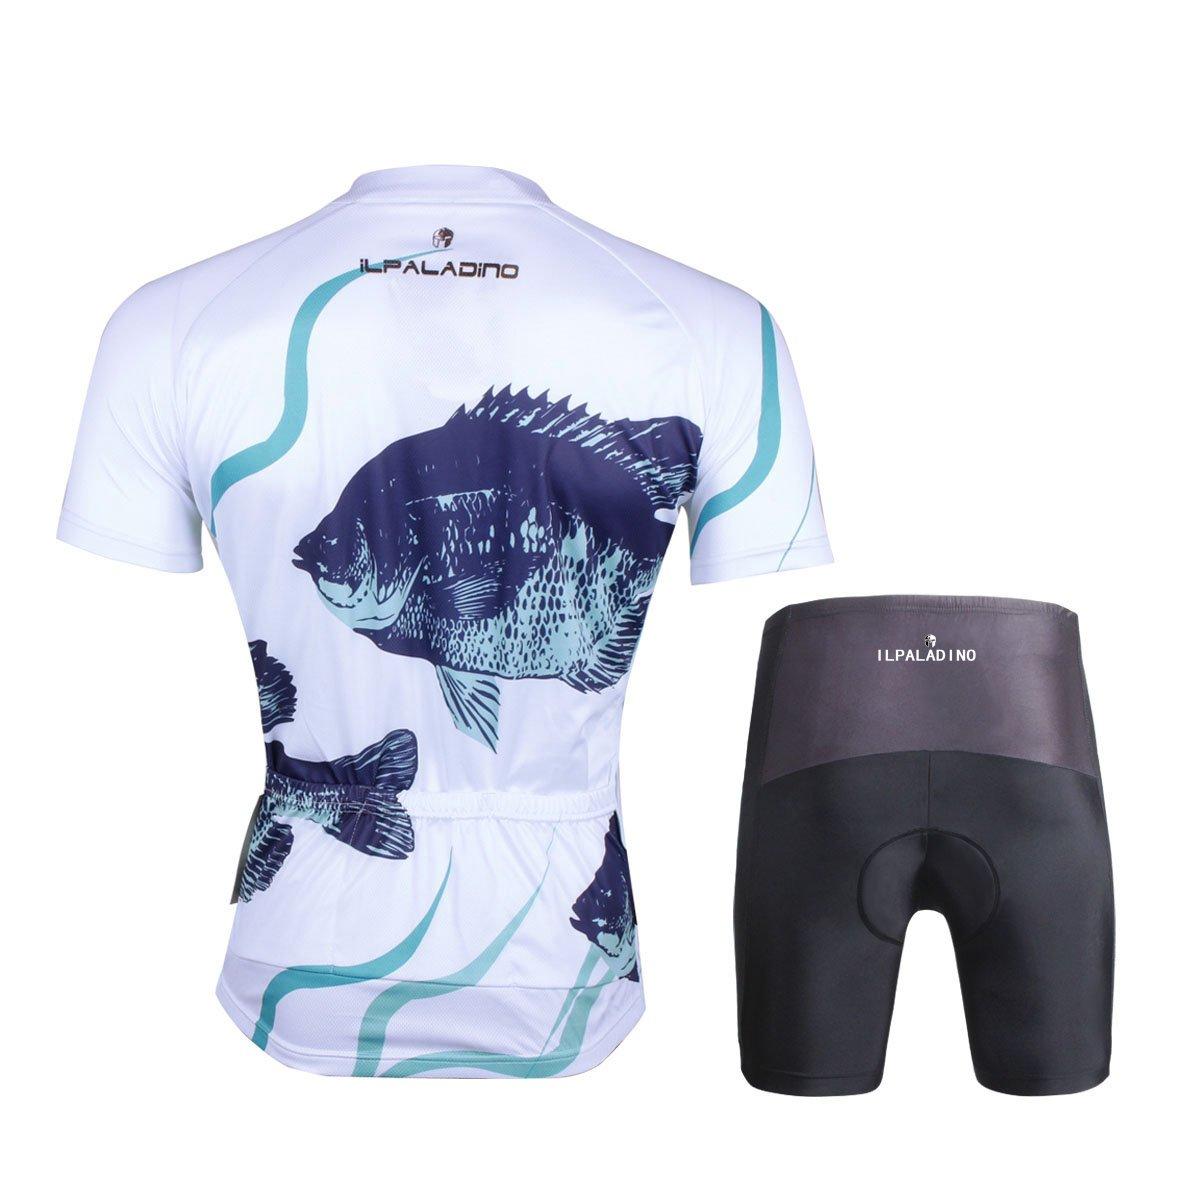 Amazon.com   Ilpaladino Men s White Cycling Shirts Fish Pattern Bike Jerseys  Tight Design   Sports   Outdoors ba05cb5cd